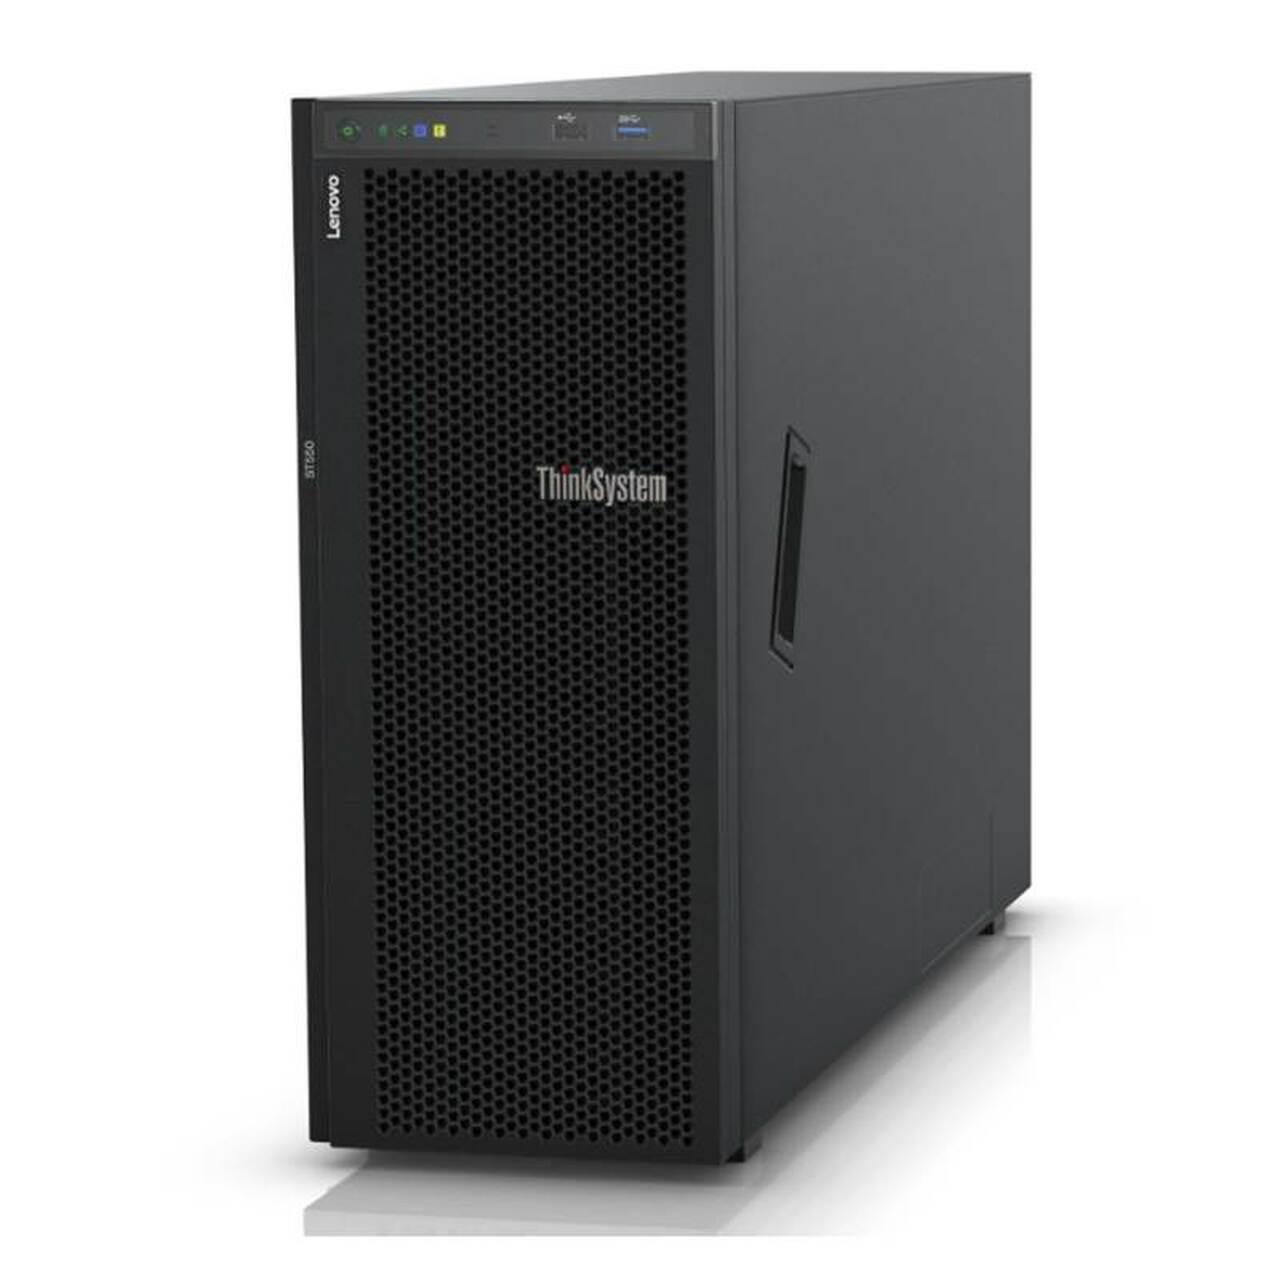 LENOVO, ThinkSystem, ST550, 4U, Tower, Server, 1x, Intel, Xeon, Silver, 4210, 1x16GB, 2Rx8, 8, x, 3.5, HS, Bays, HW, RAID, 530-8i, 1x75,